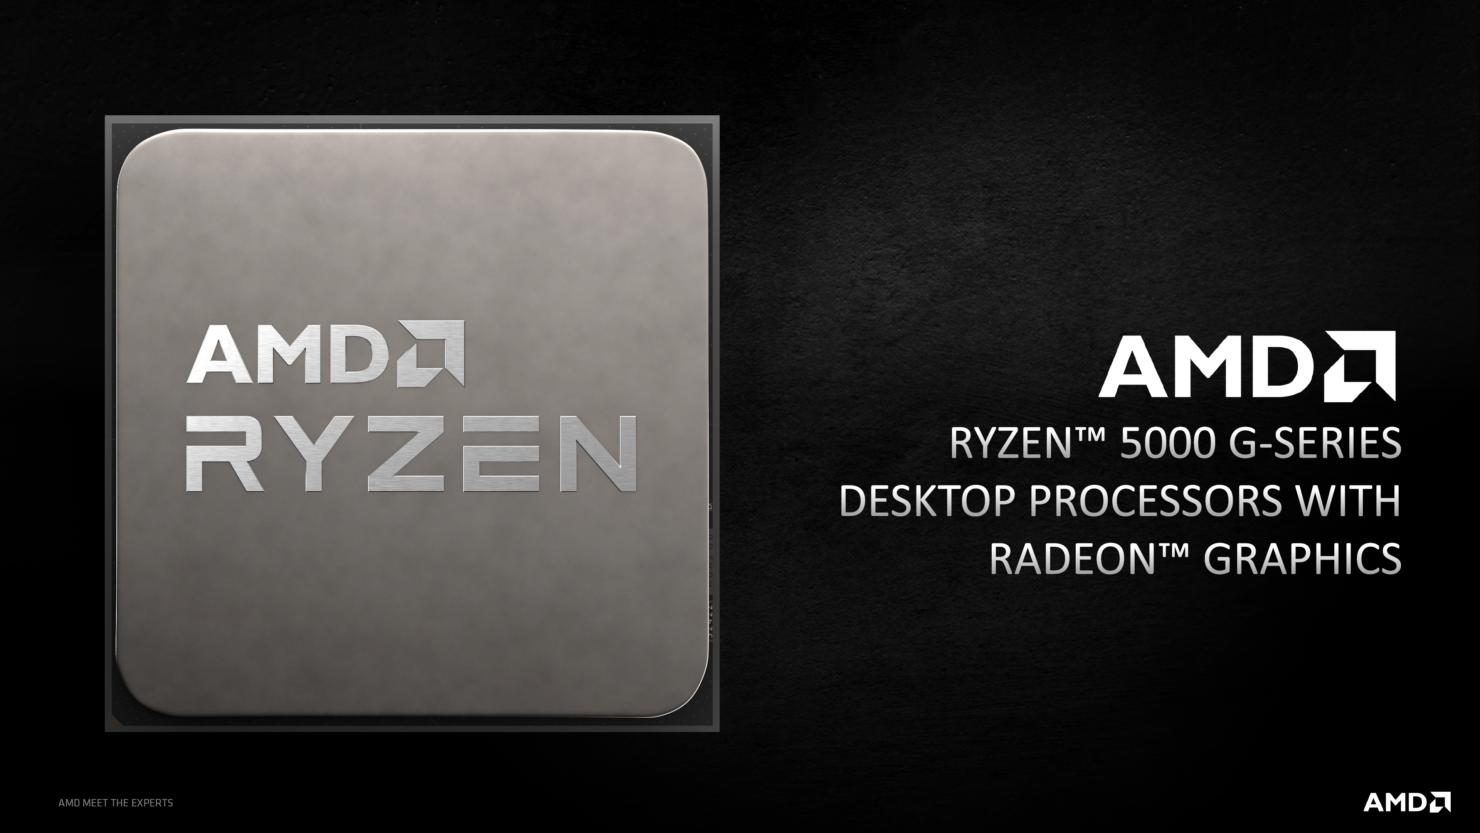 amd-ryzen-5000g-desktop-apus-launch-_-ryzen-7-5700g-ryzen-5-5600g-_1